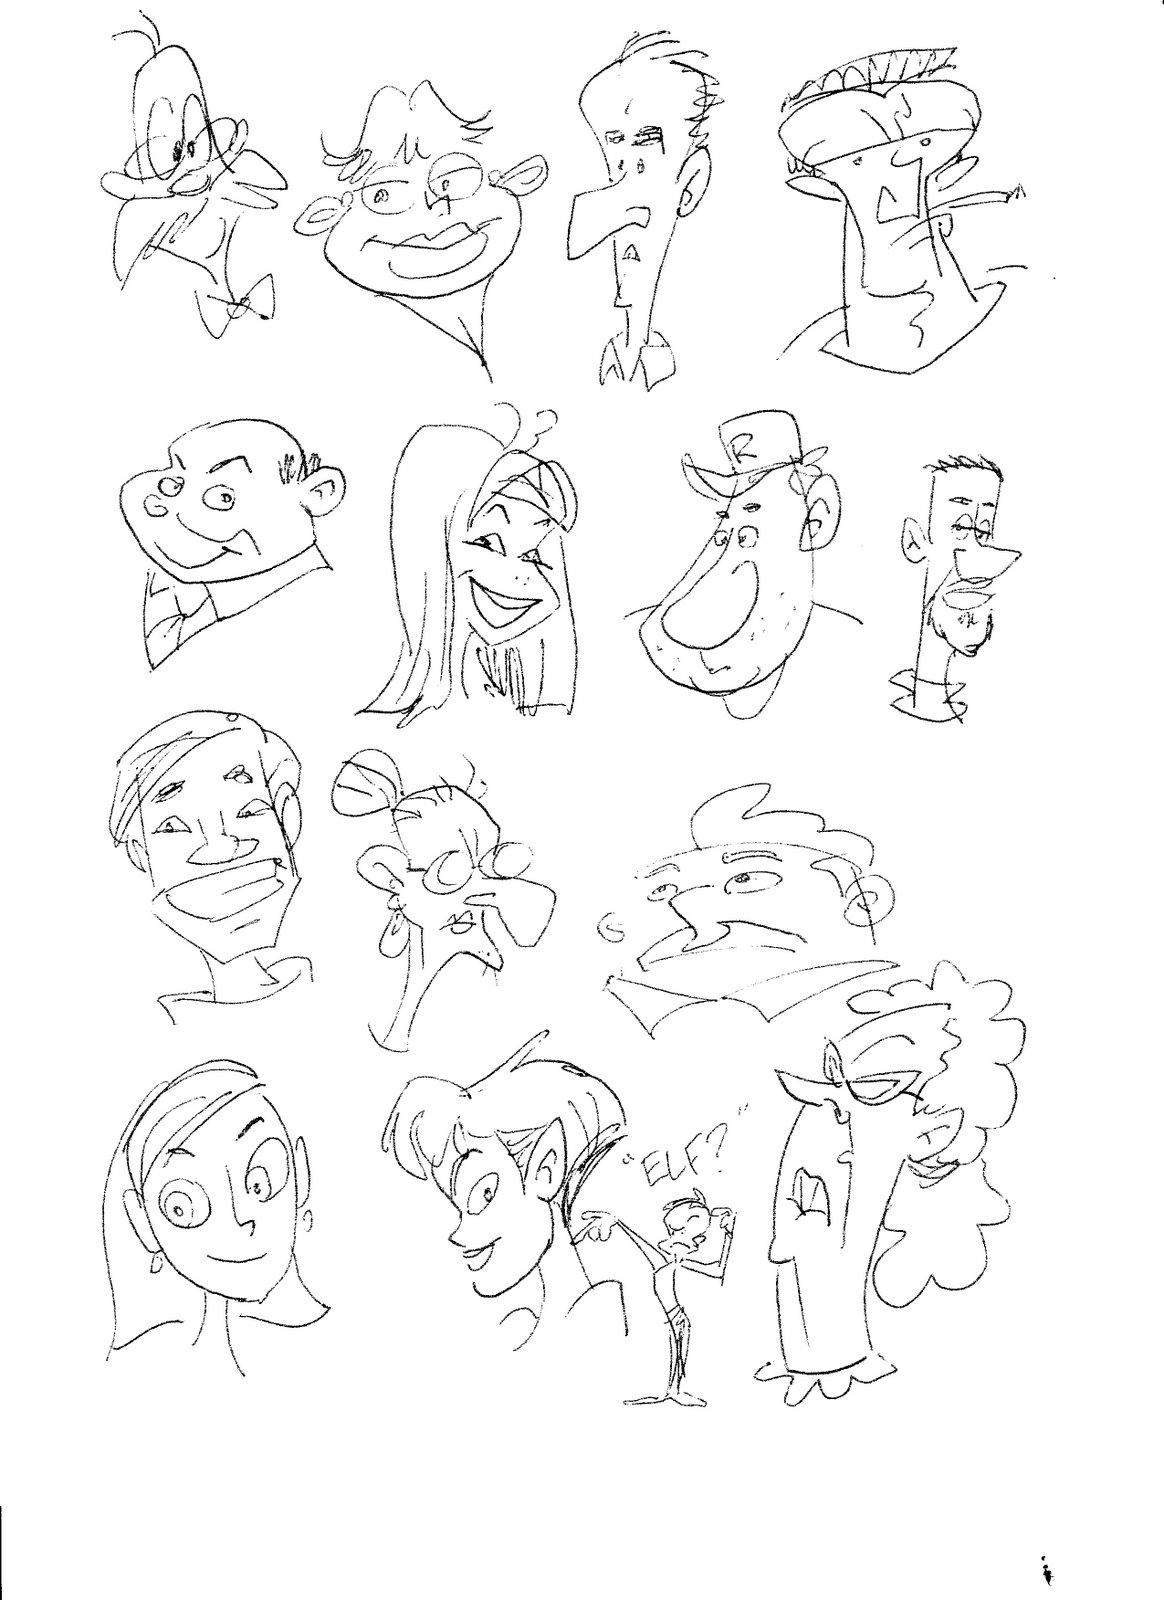 [faces1.PIC]